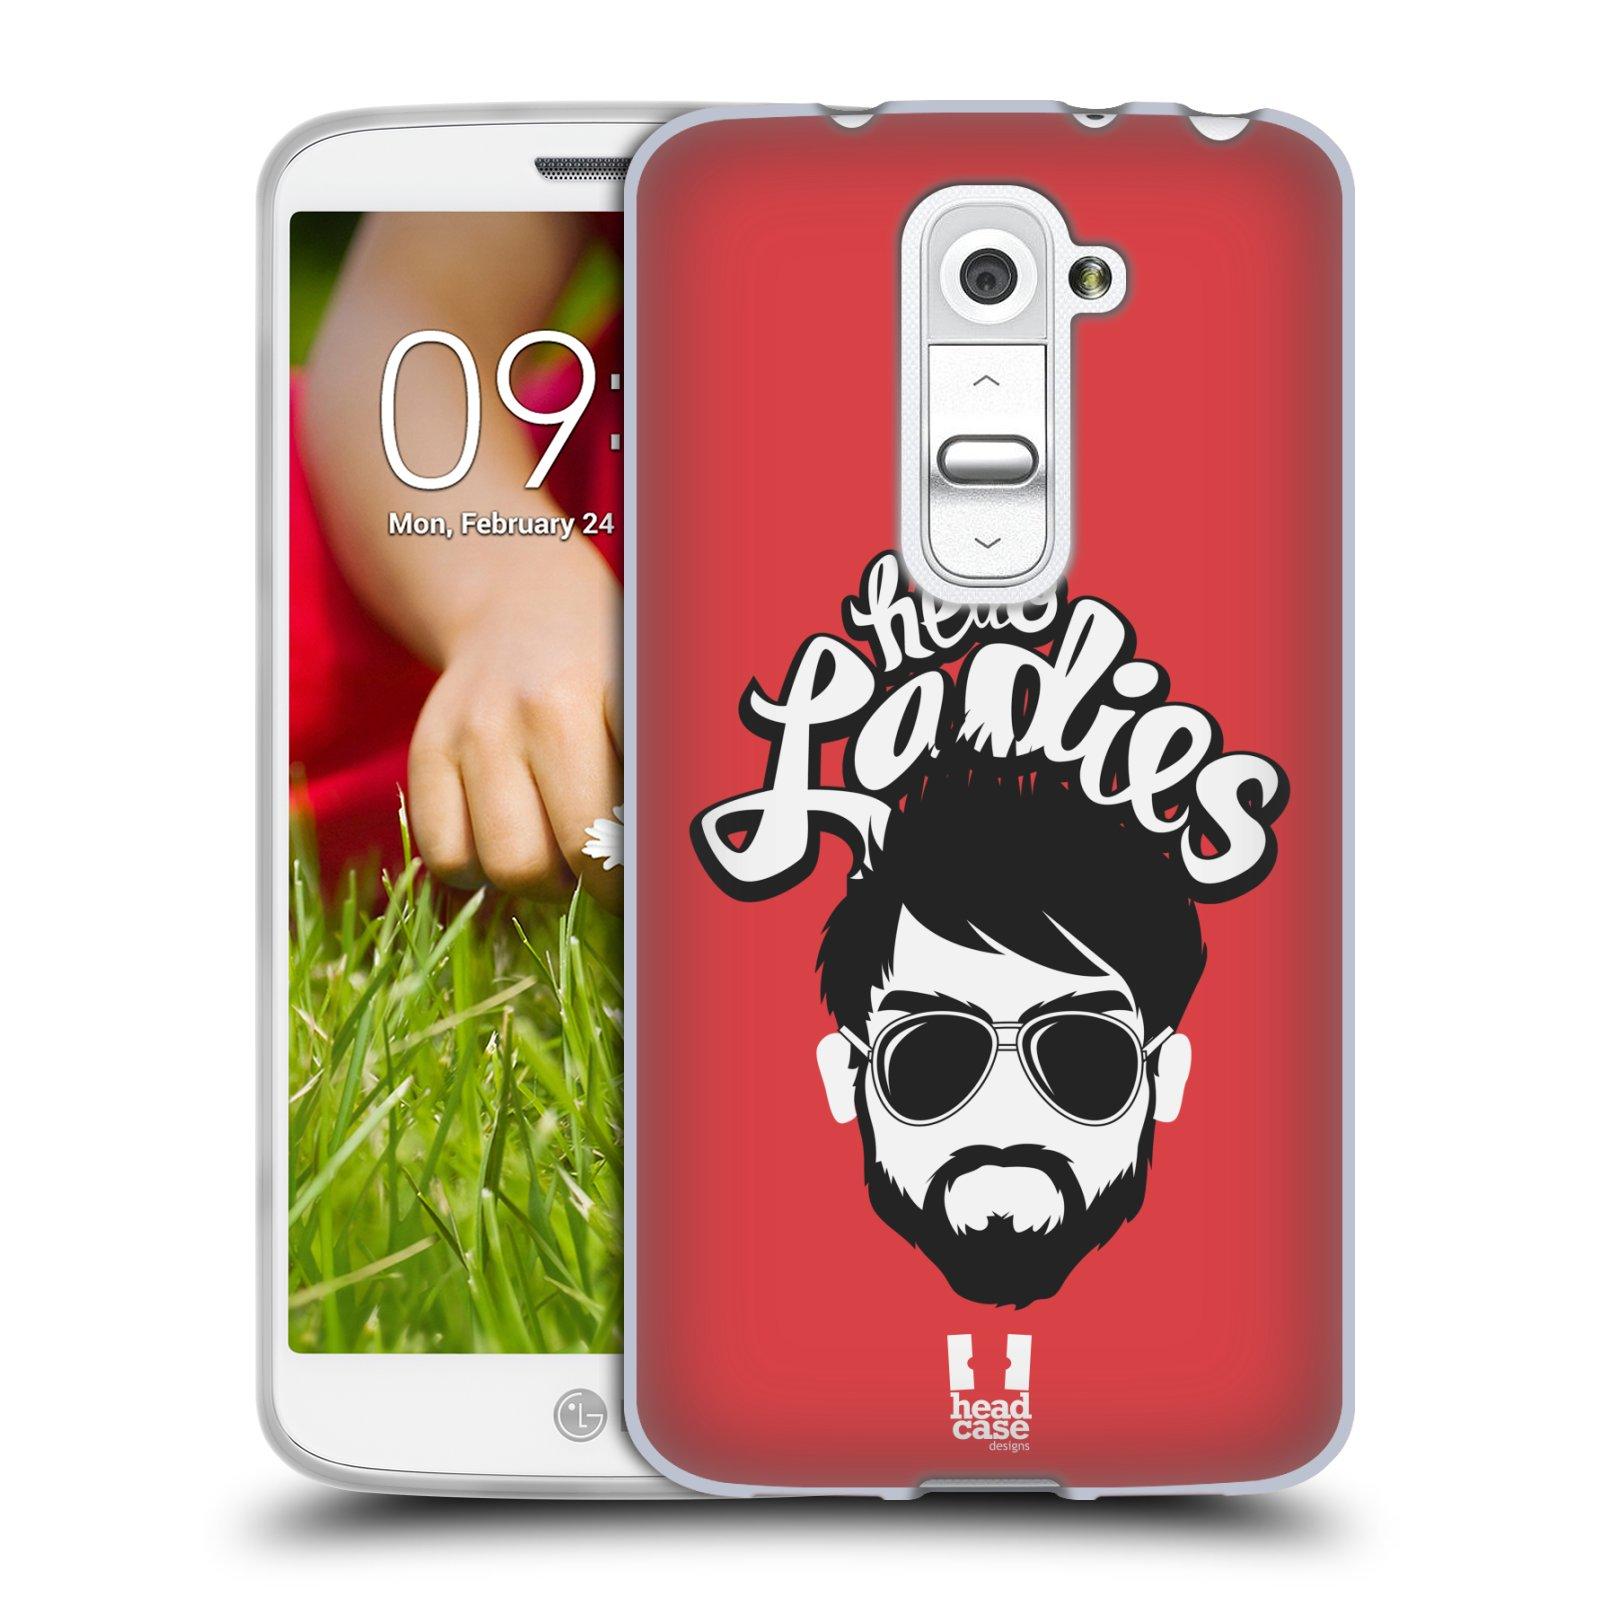 Silikonové pouzdro na mobil LG G2 Mini HEAD CASE KNÍRAČ HELLO LADIES (Silikonový kryt či obal na mobilní telefon LG G2 Mini D620)